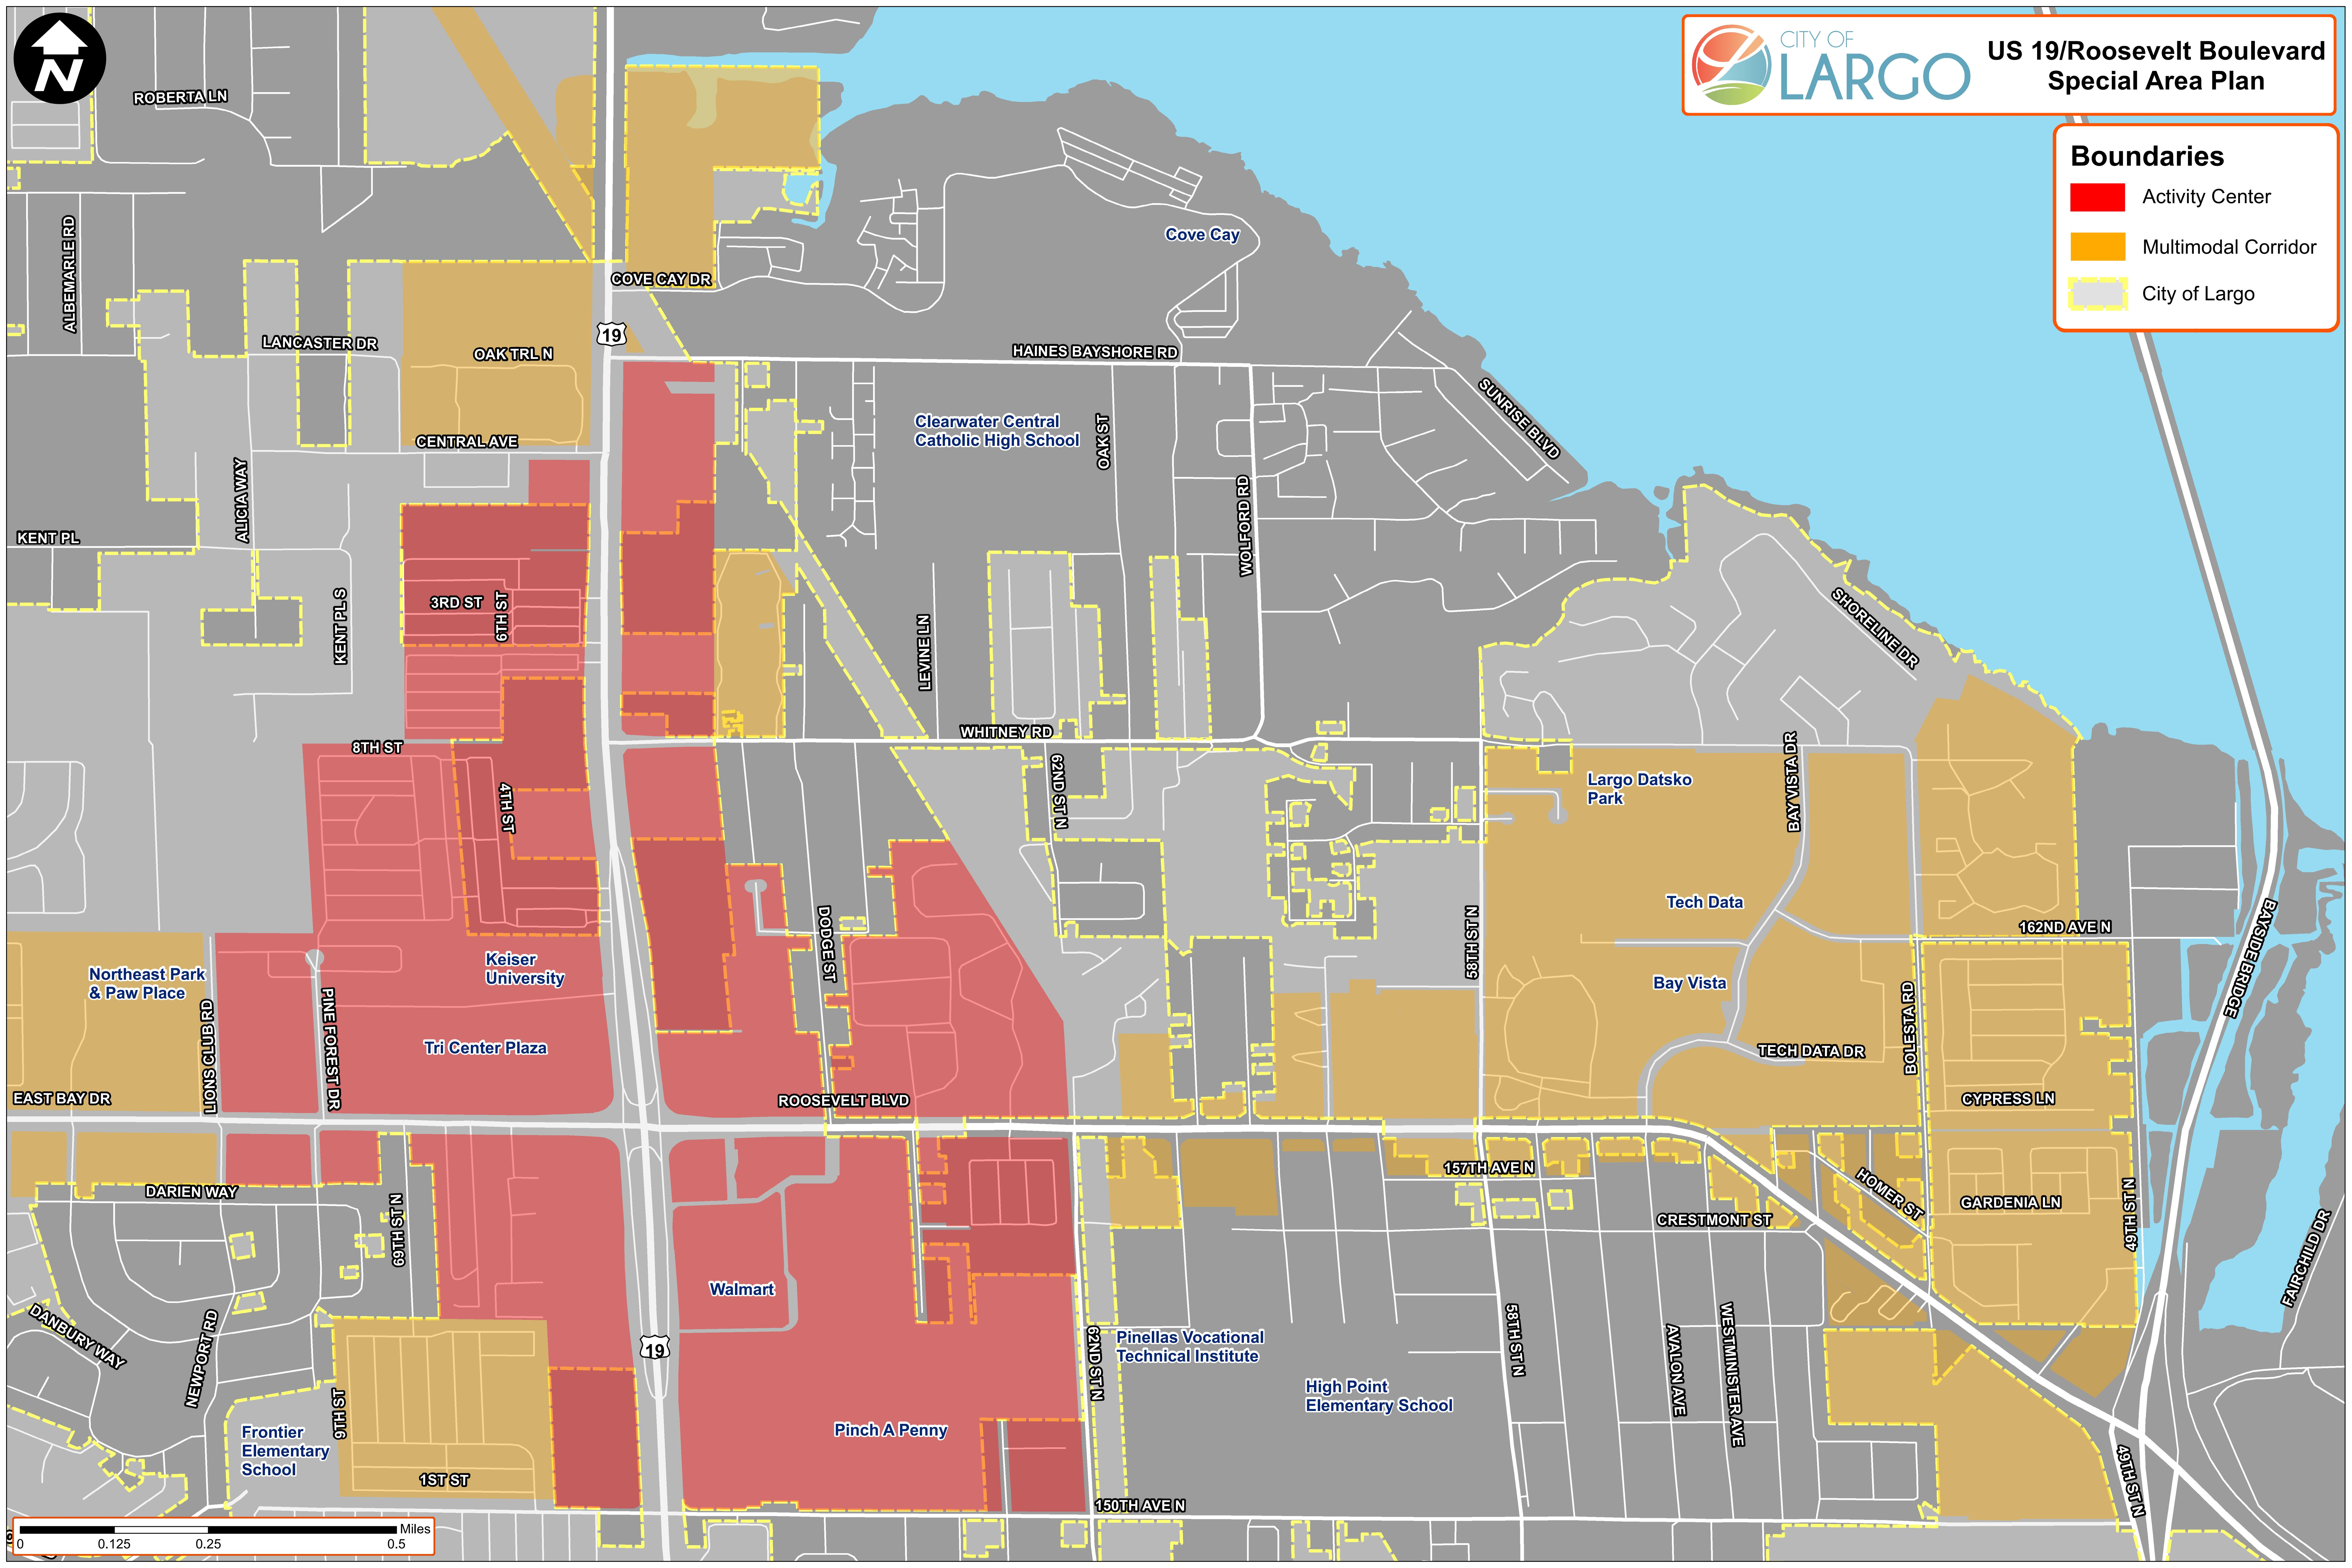 US 19/Roosevelt Boulevard Special Area Plan